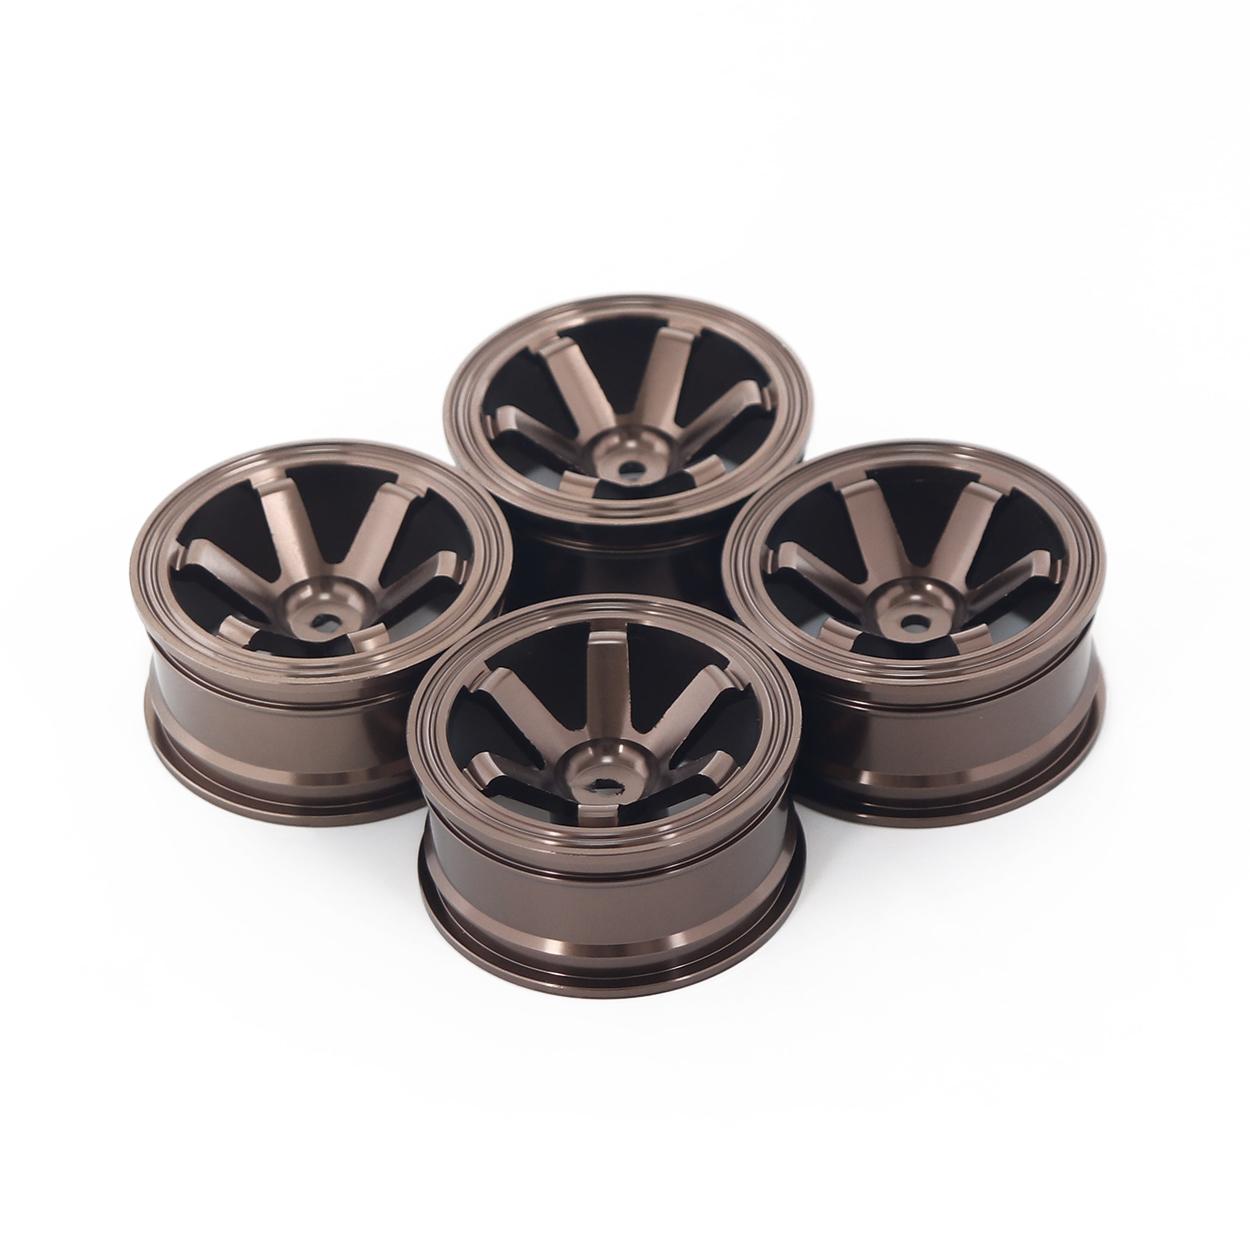 4PCS Metal Wheel Rim 1.9 Inch BEADLOCK for 1/10 RC Rock Crawler Axial SCX10 90046 AX103007 TAMIYA CC01 D90 TF2 Traxxas TRX-4 Six-spoke coffee